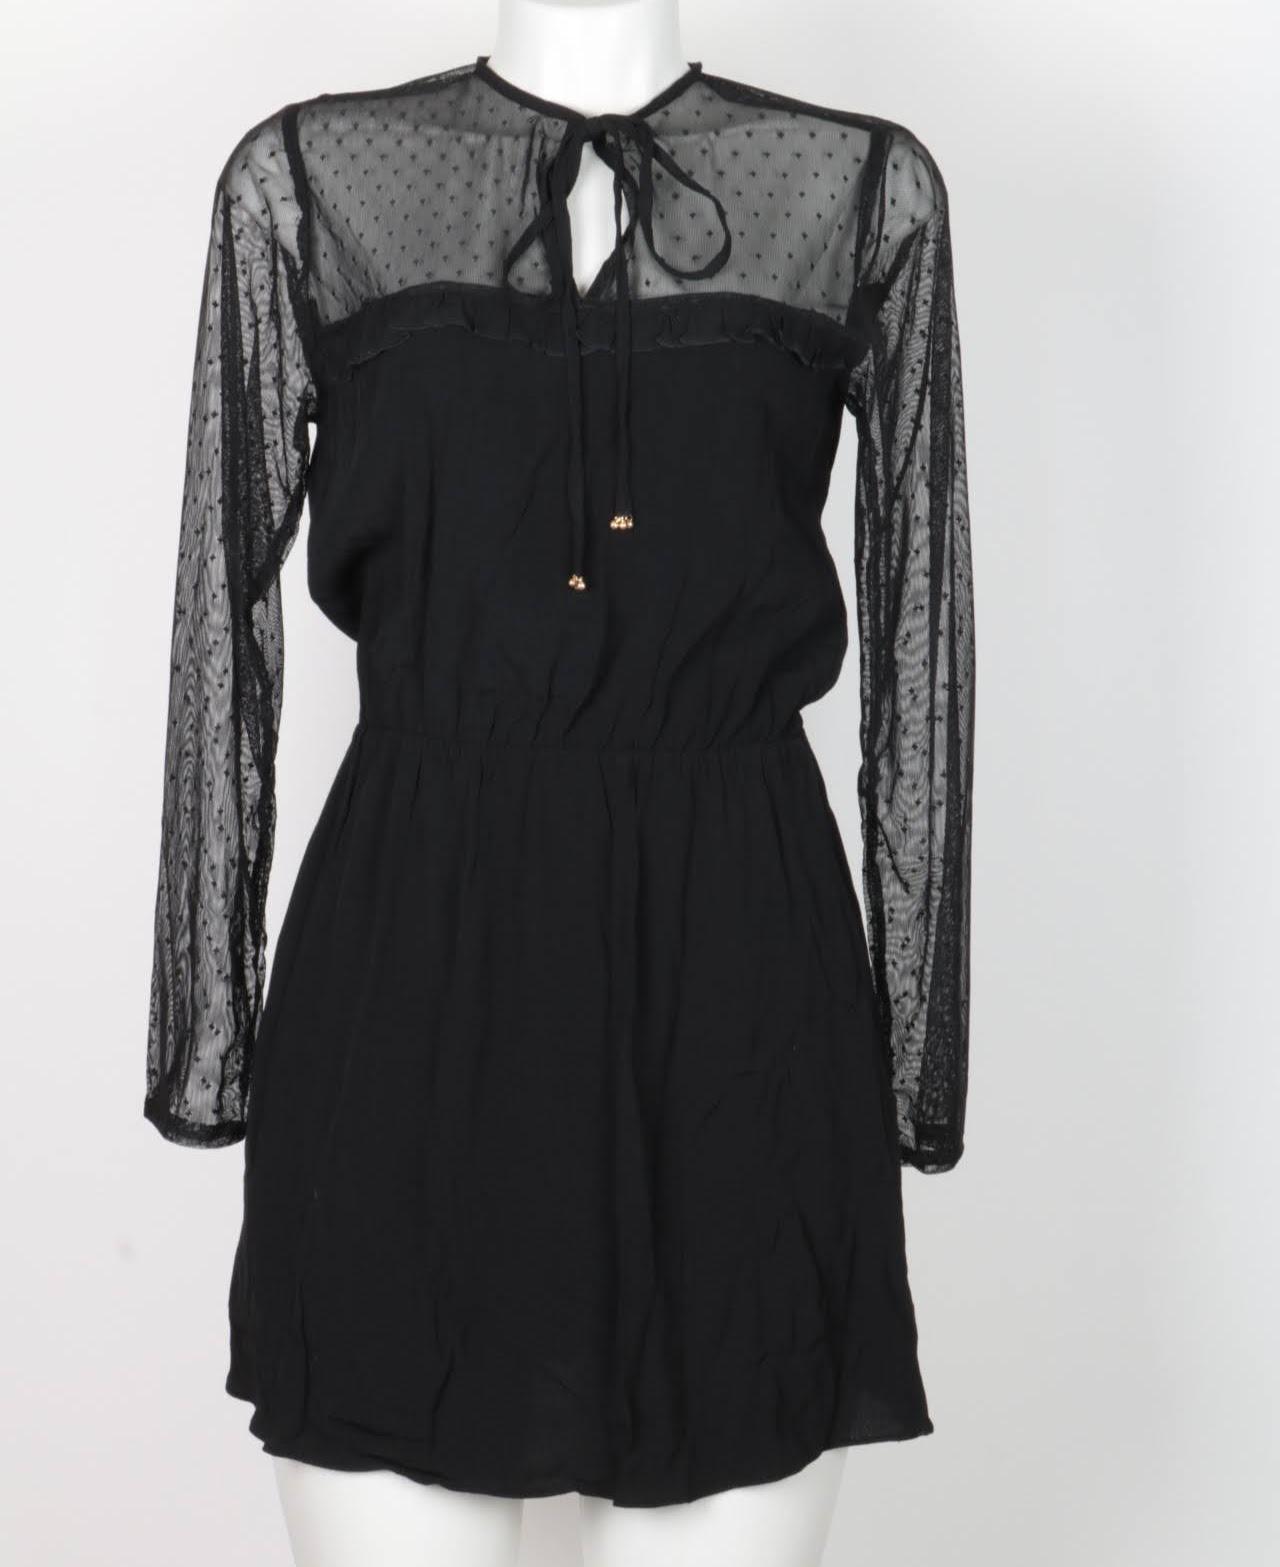 Vestido Curto - Amaro - 38